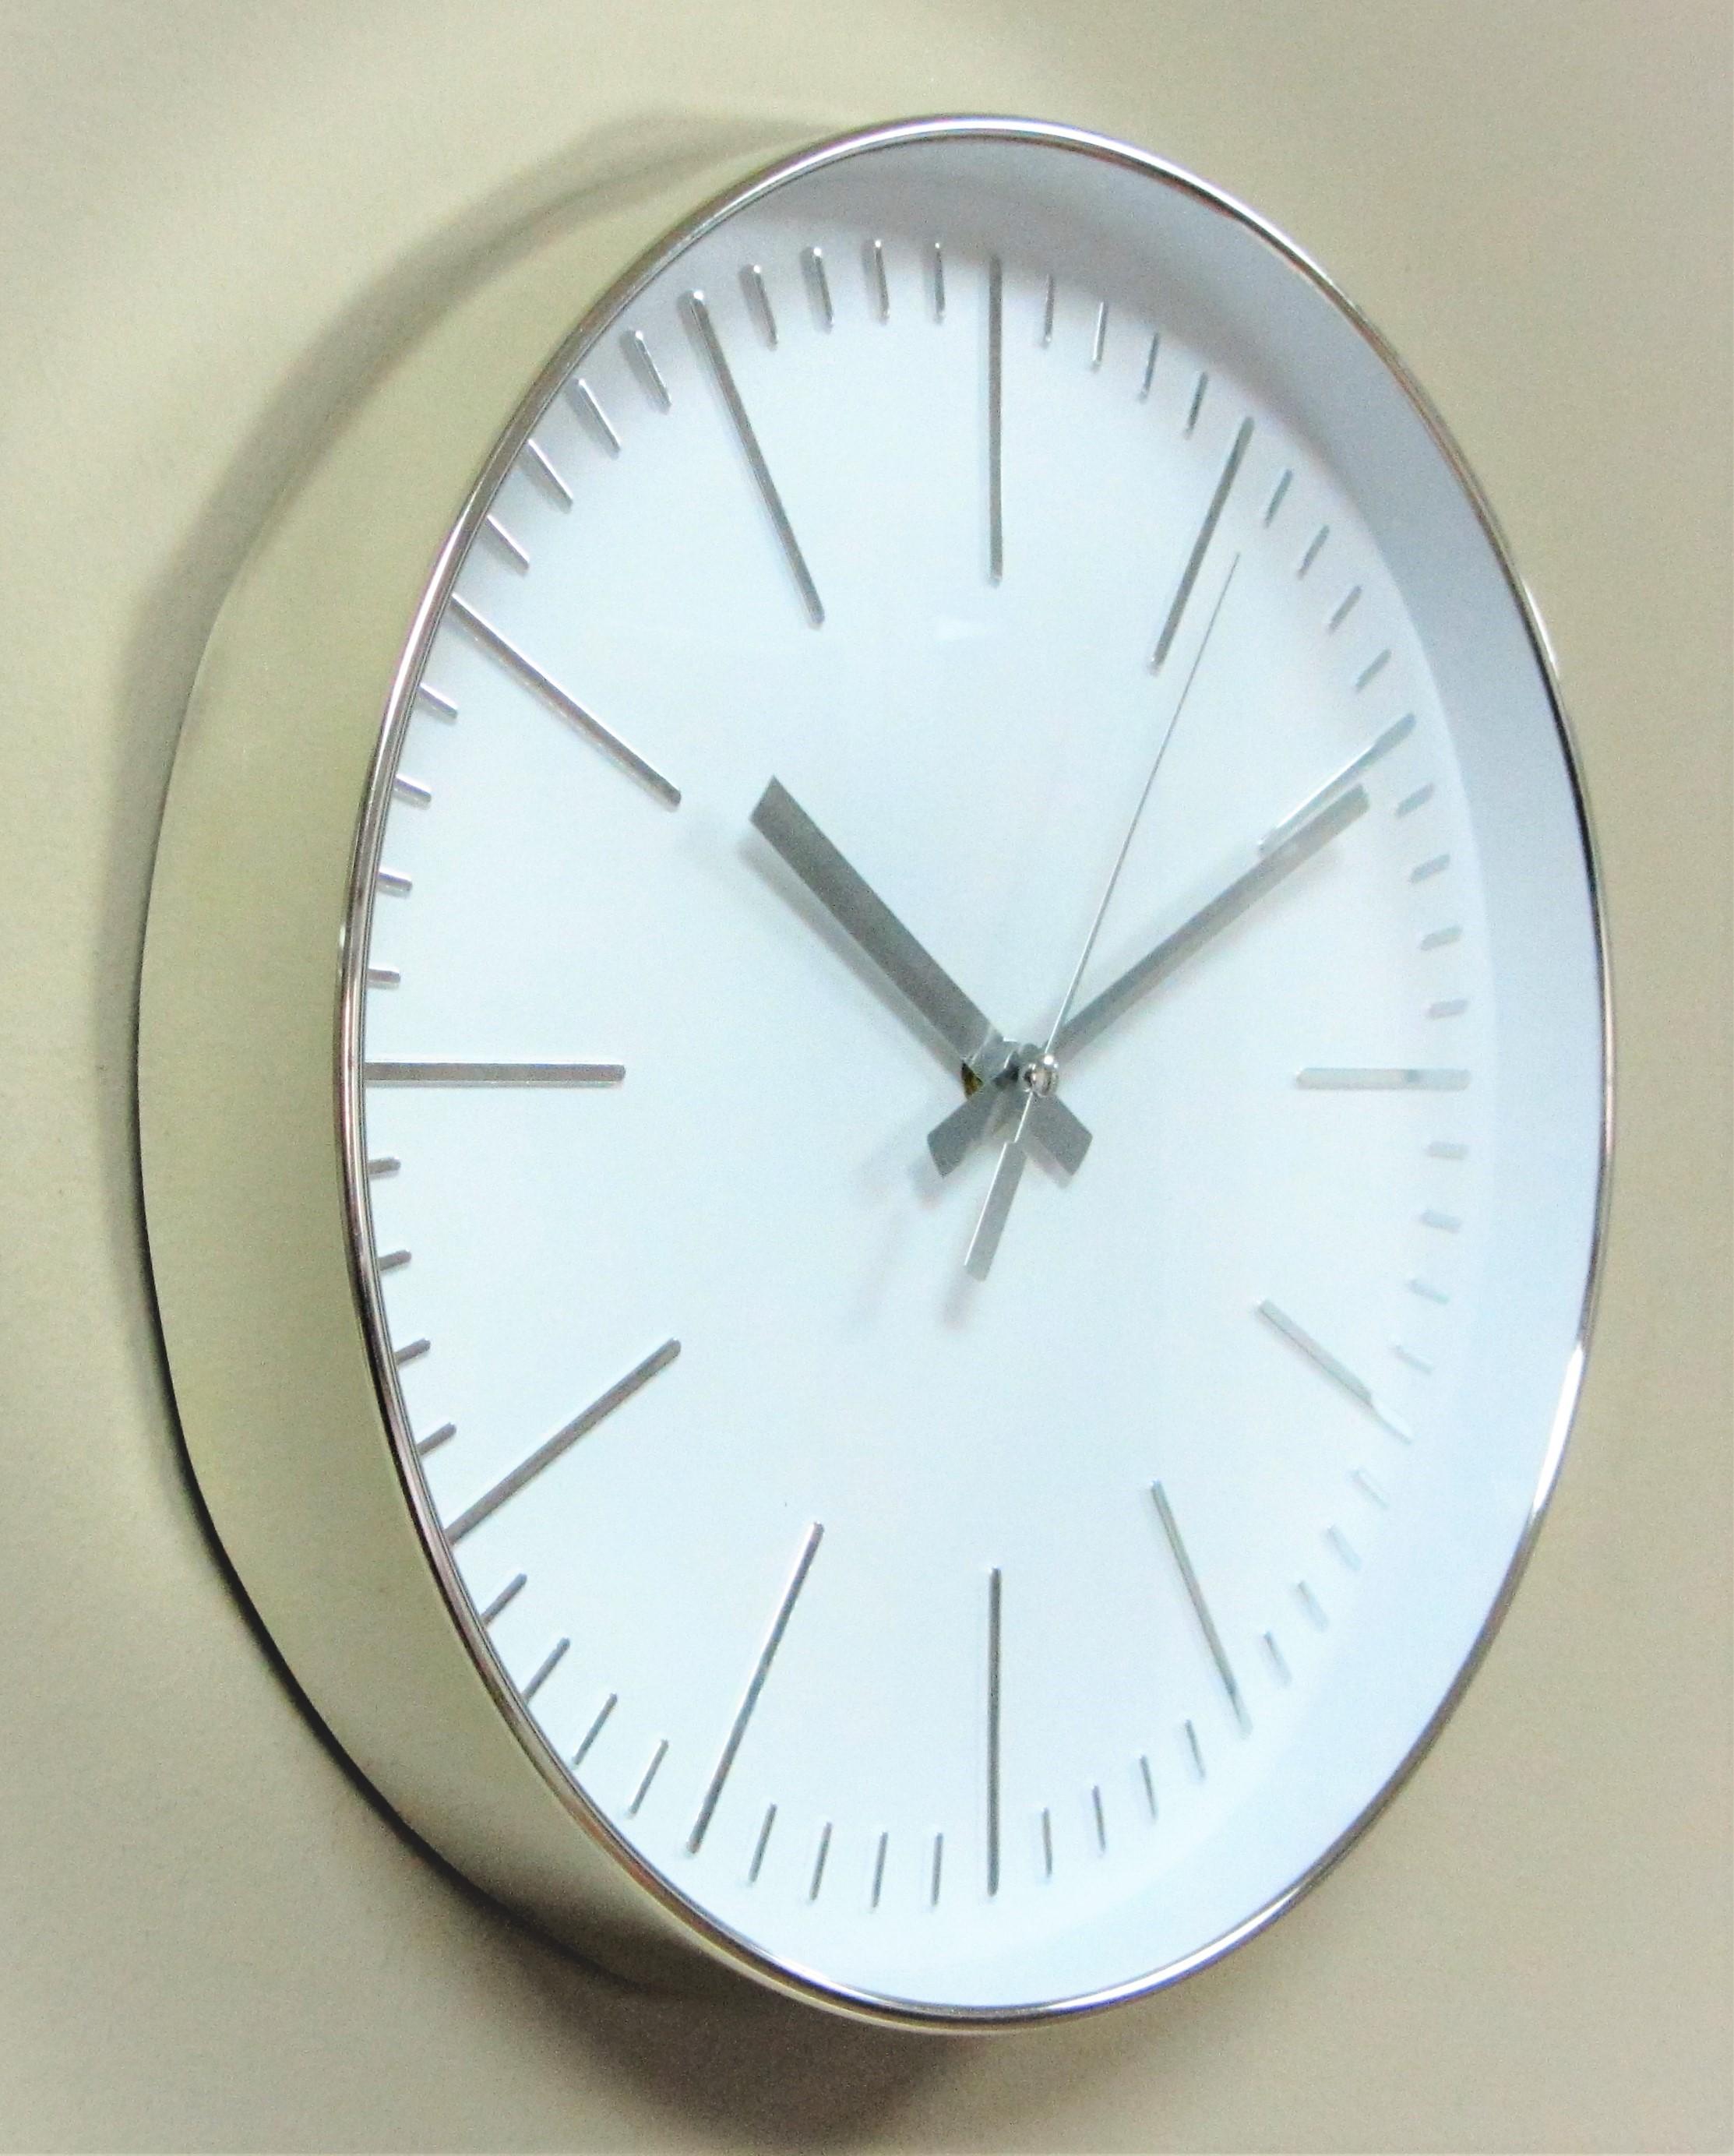 IMC Wanduhr Metall-Look Uhr Büro Küche Wohnzimmer modern großes  Ziffernblatt weiß gut lesbar Quartz XL